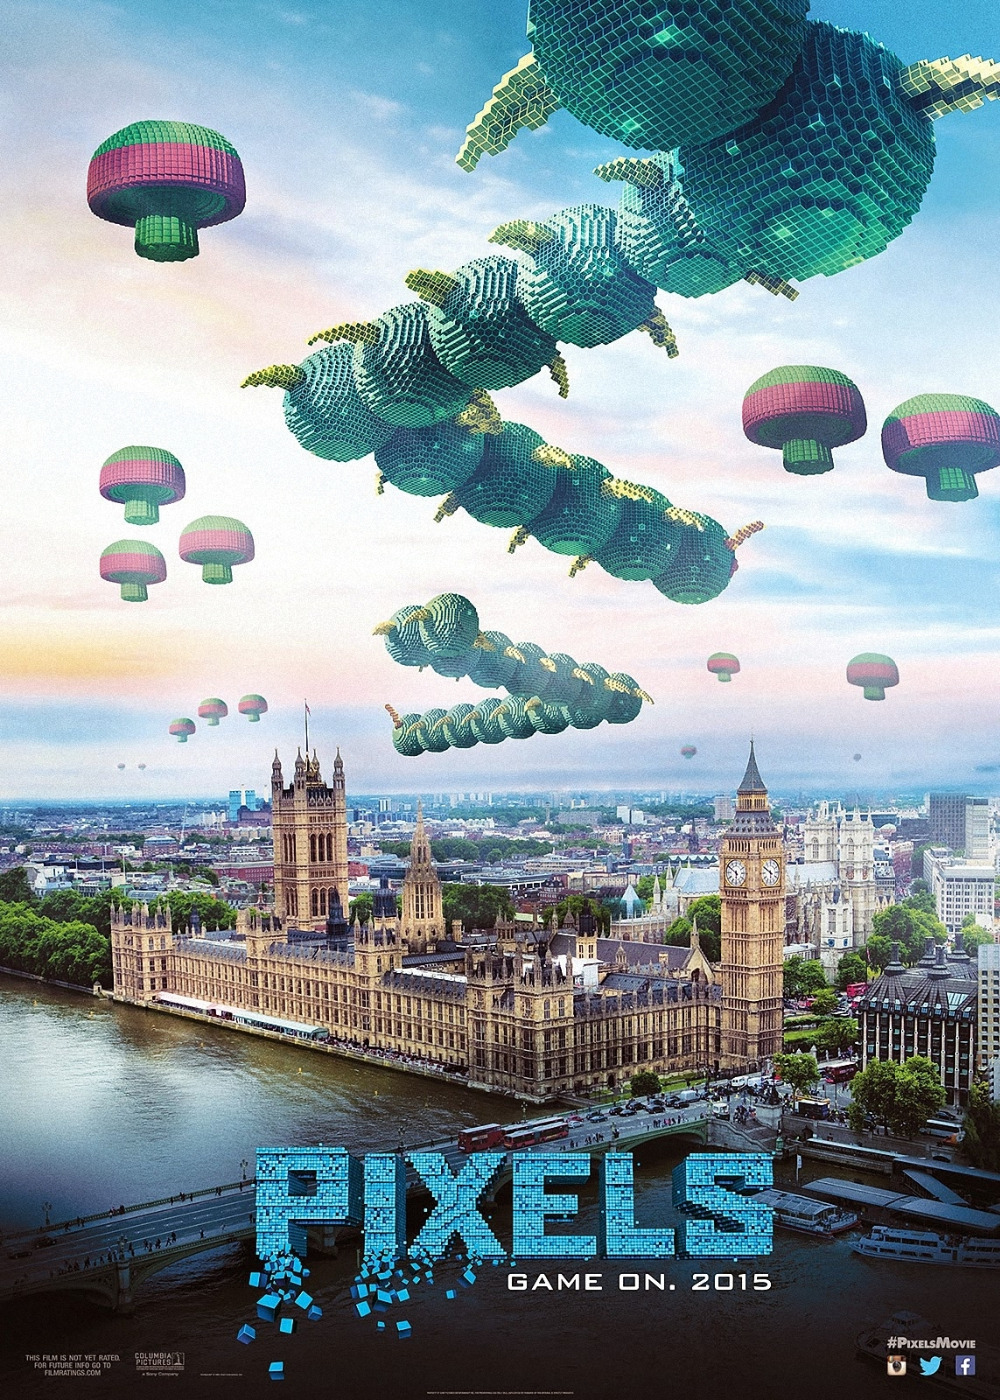 Simple Wallpaper Movie Pixels - Free-shipping-Pixels-2015-Movie-Poster-HD-HOME-WALL-Decor-Custom-ART-PRINT-Silk-Wallpaper-unframed  Snapshot_95584.jpg